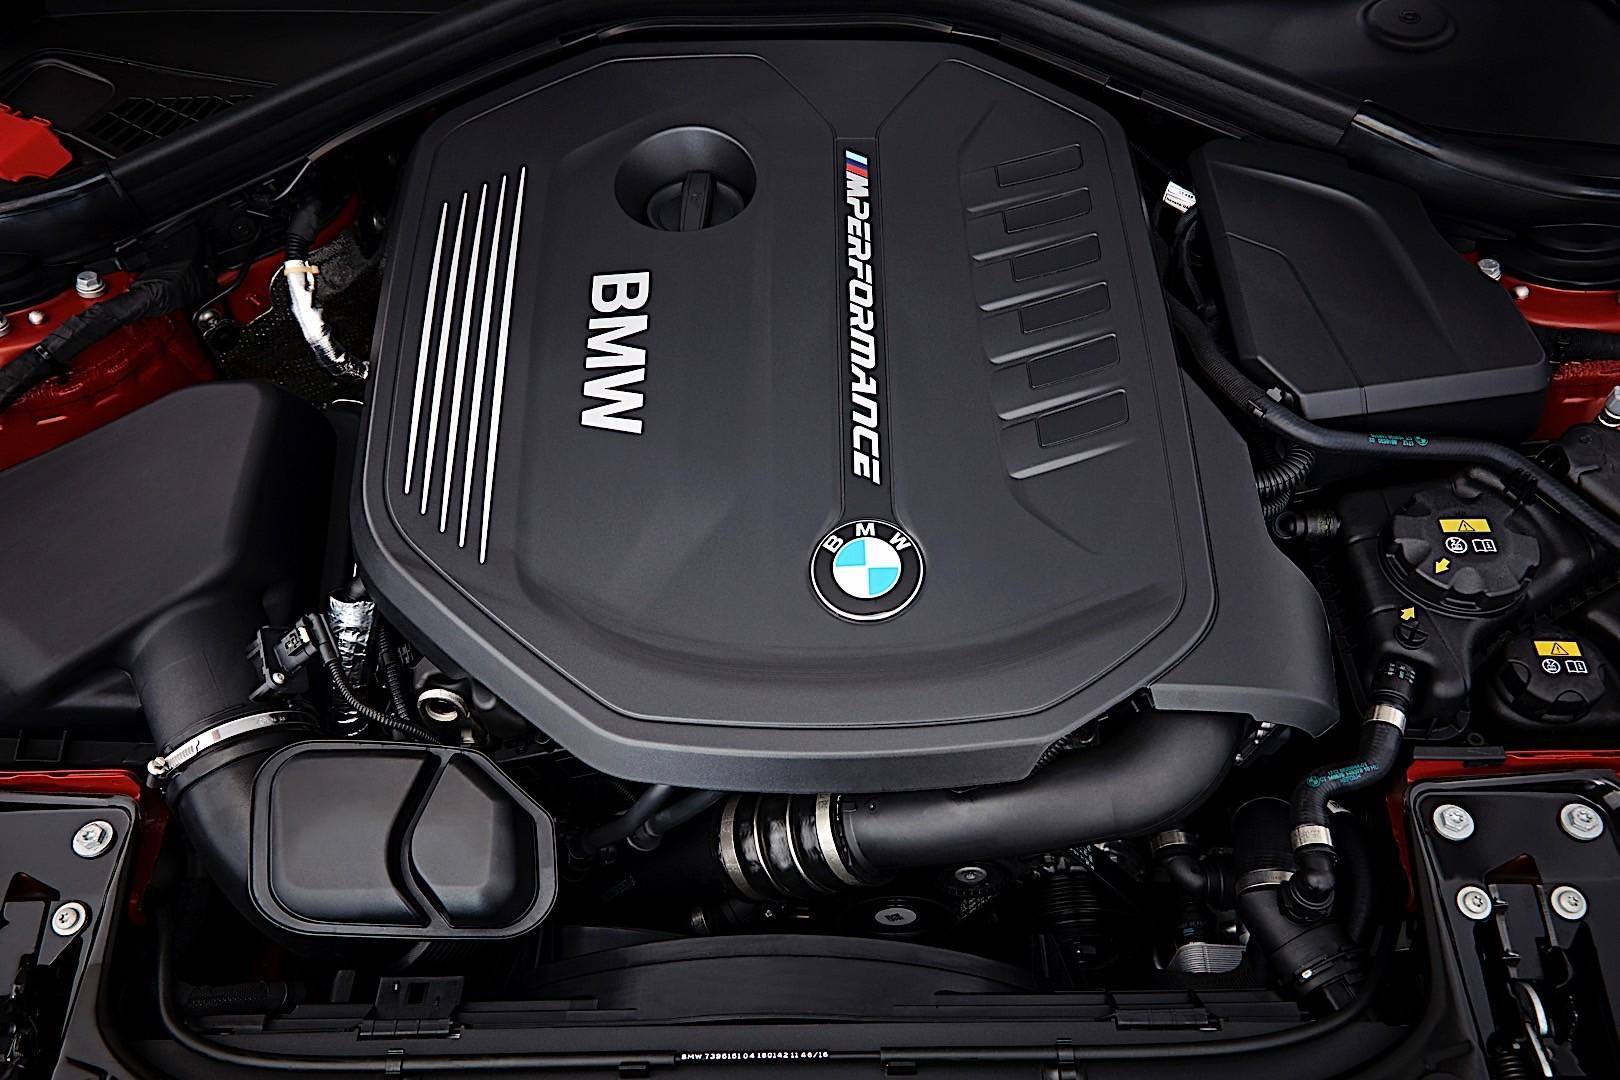 BMW 2 Series (F22) LCI specs & photos - 2017, 2018, 2019, 2020 ...